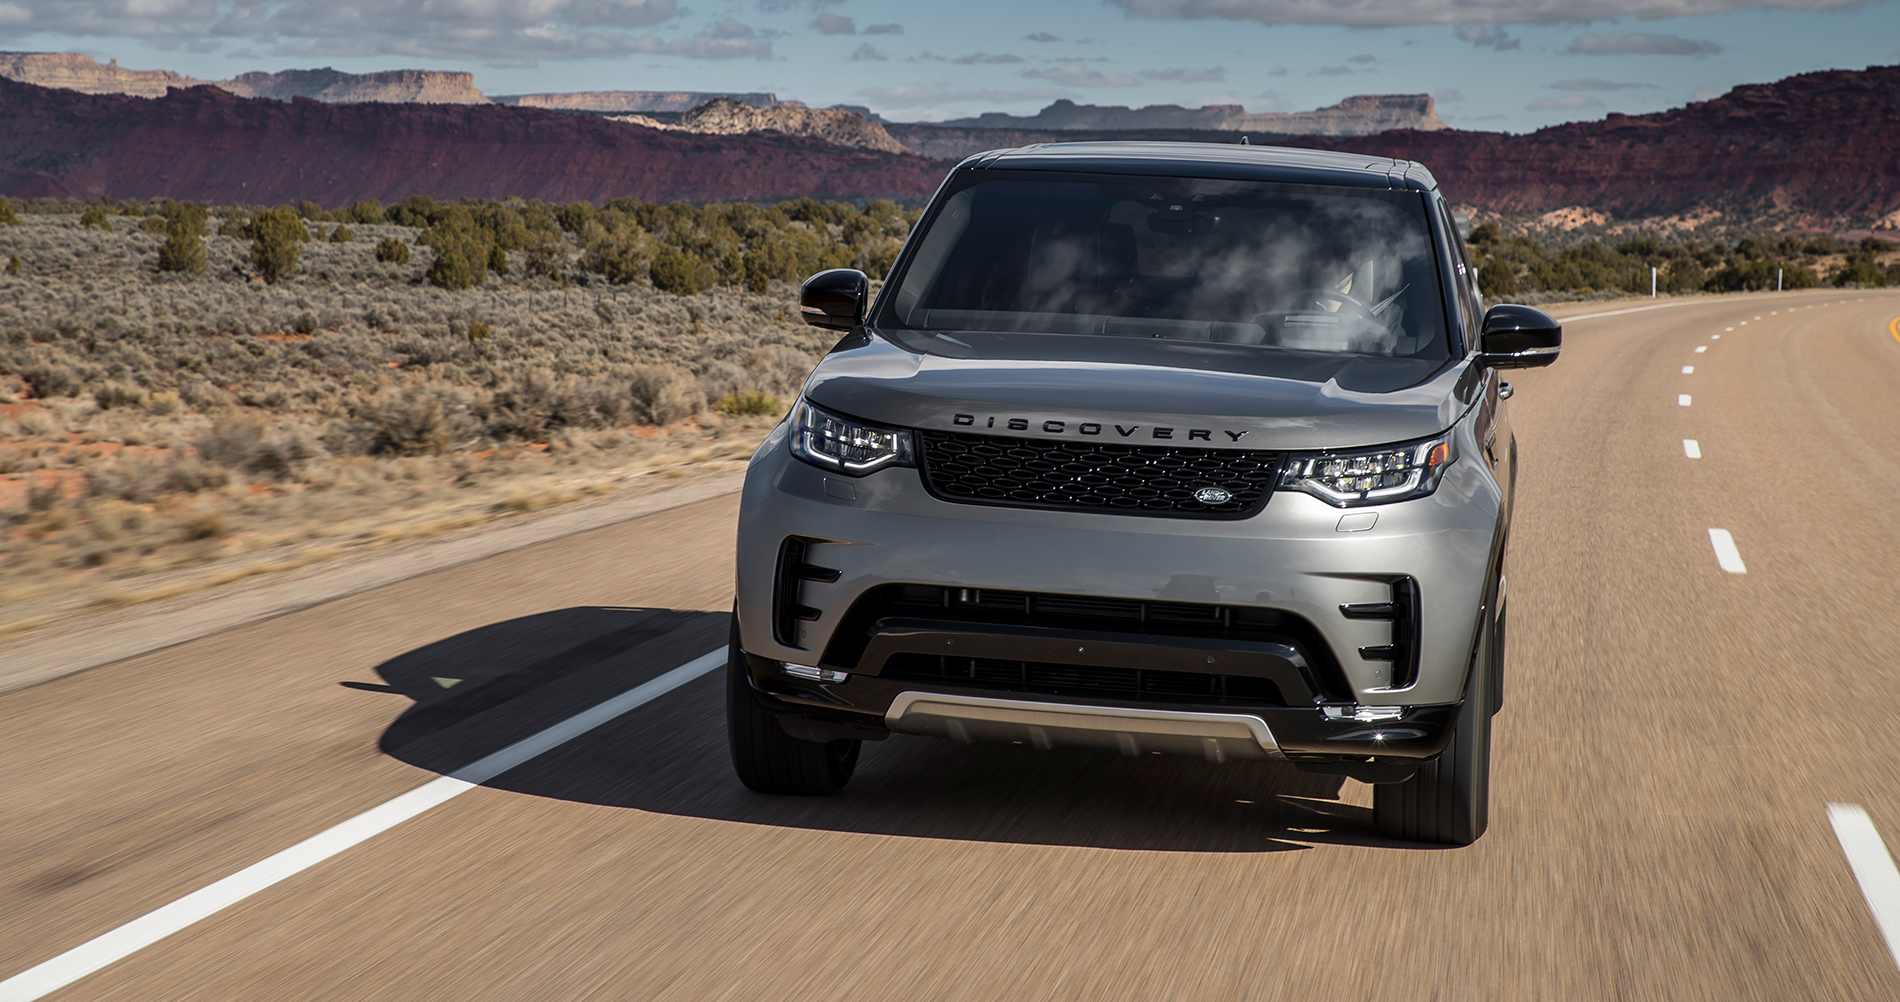 Range rover 2019: каким будет рестайлинг?